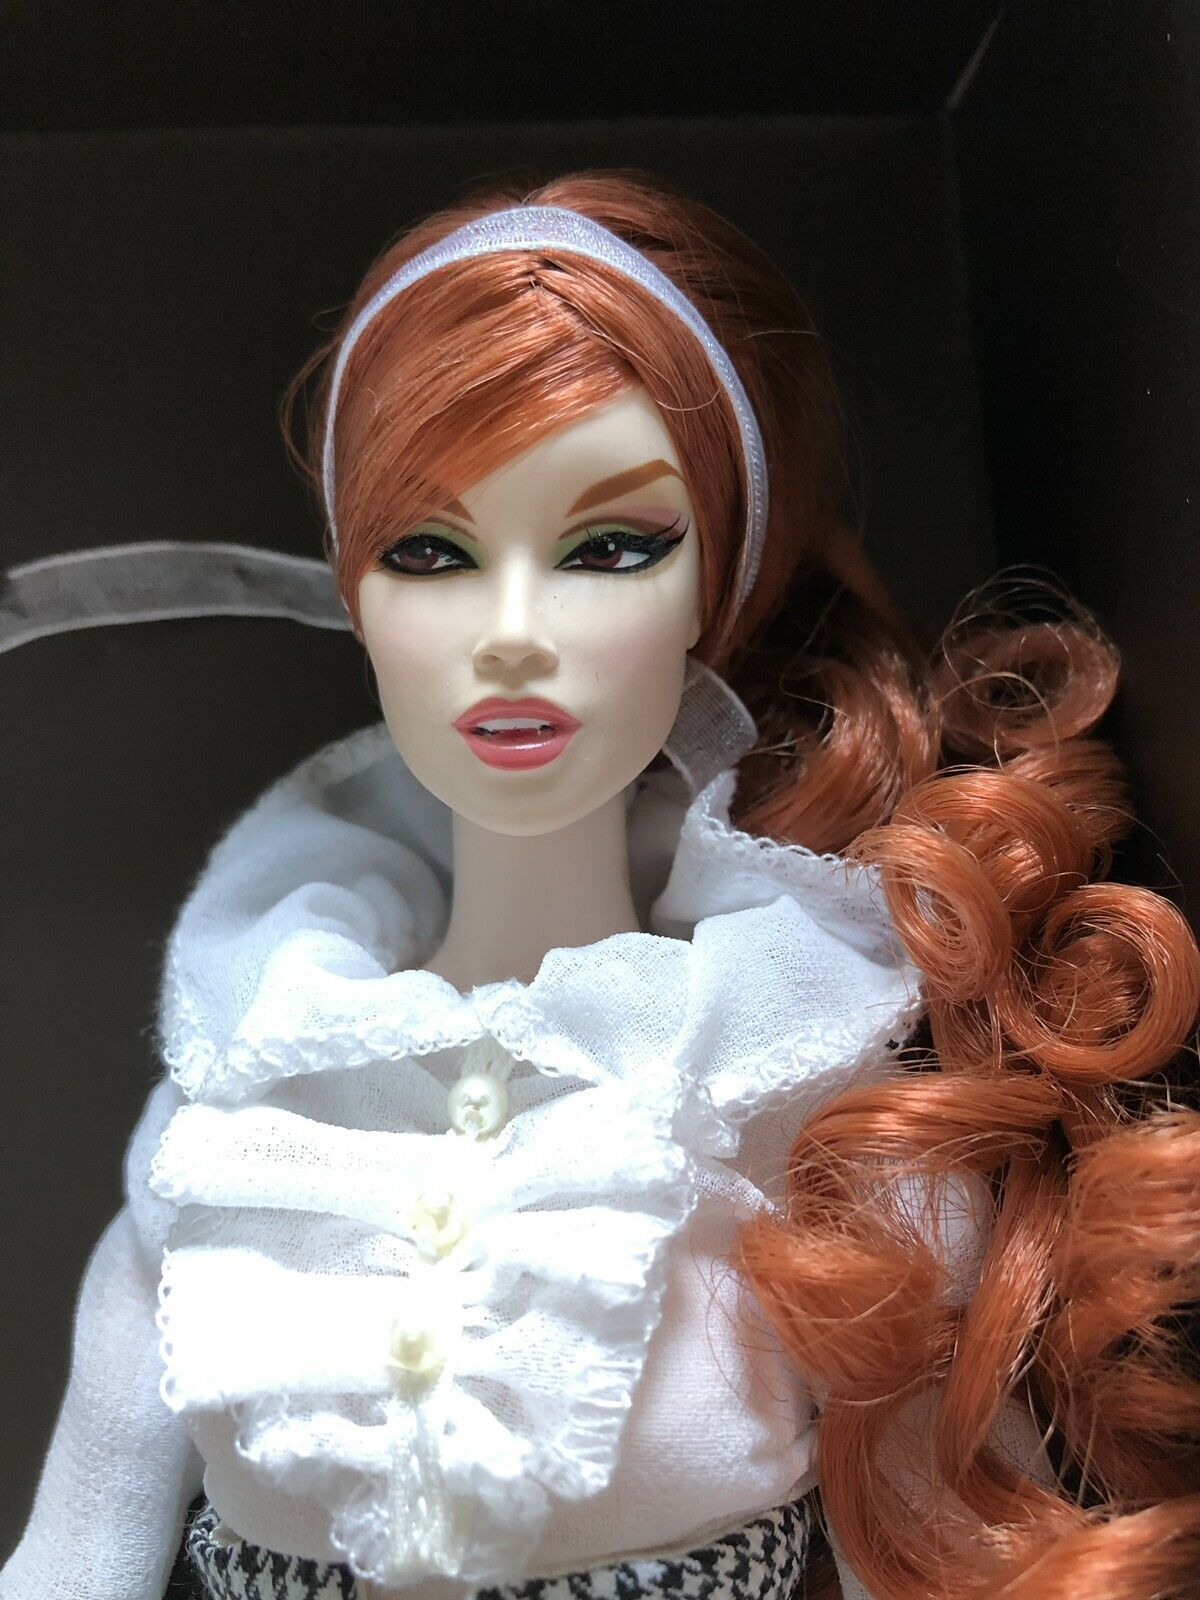 Fantastic ONLY GINGER Bride Of Dracula moda Royalty  (silkstone jason wu bambola)  ampia selezione